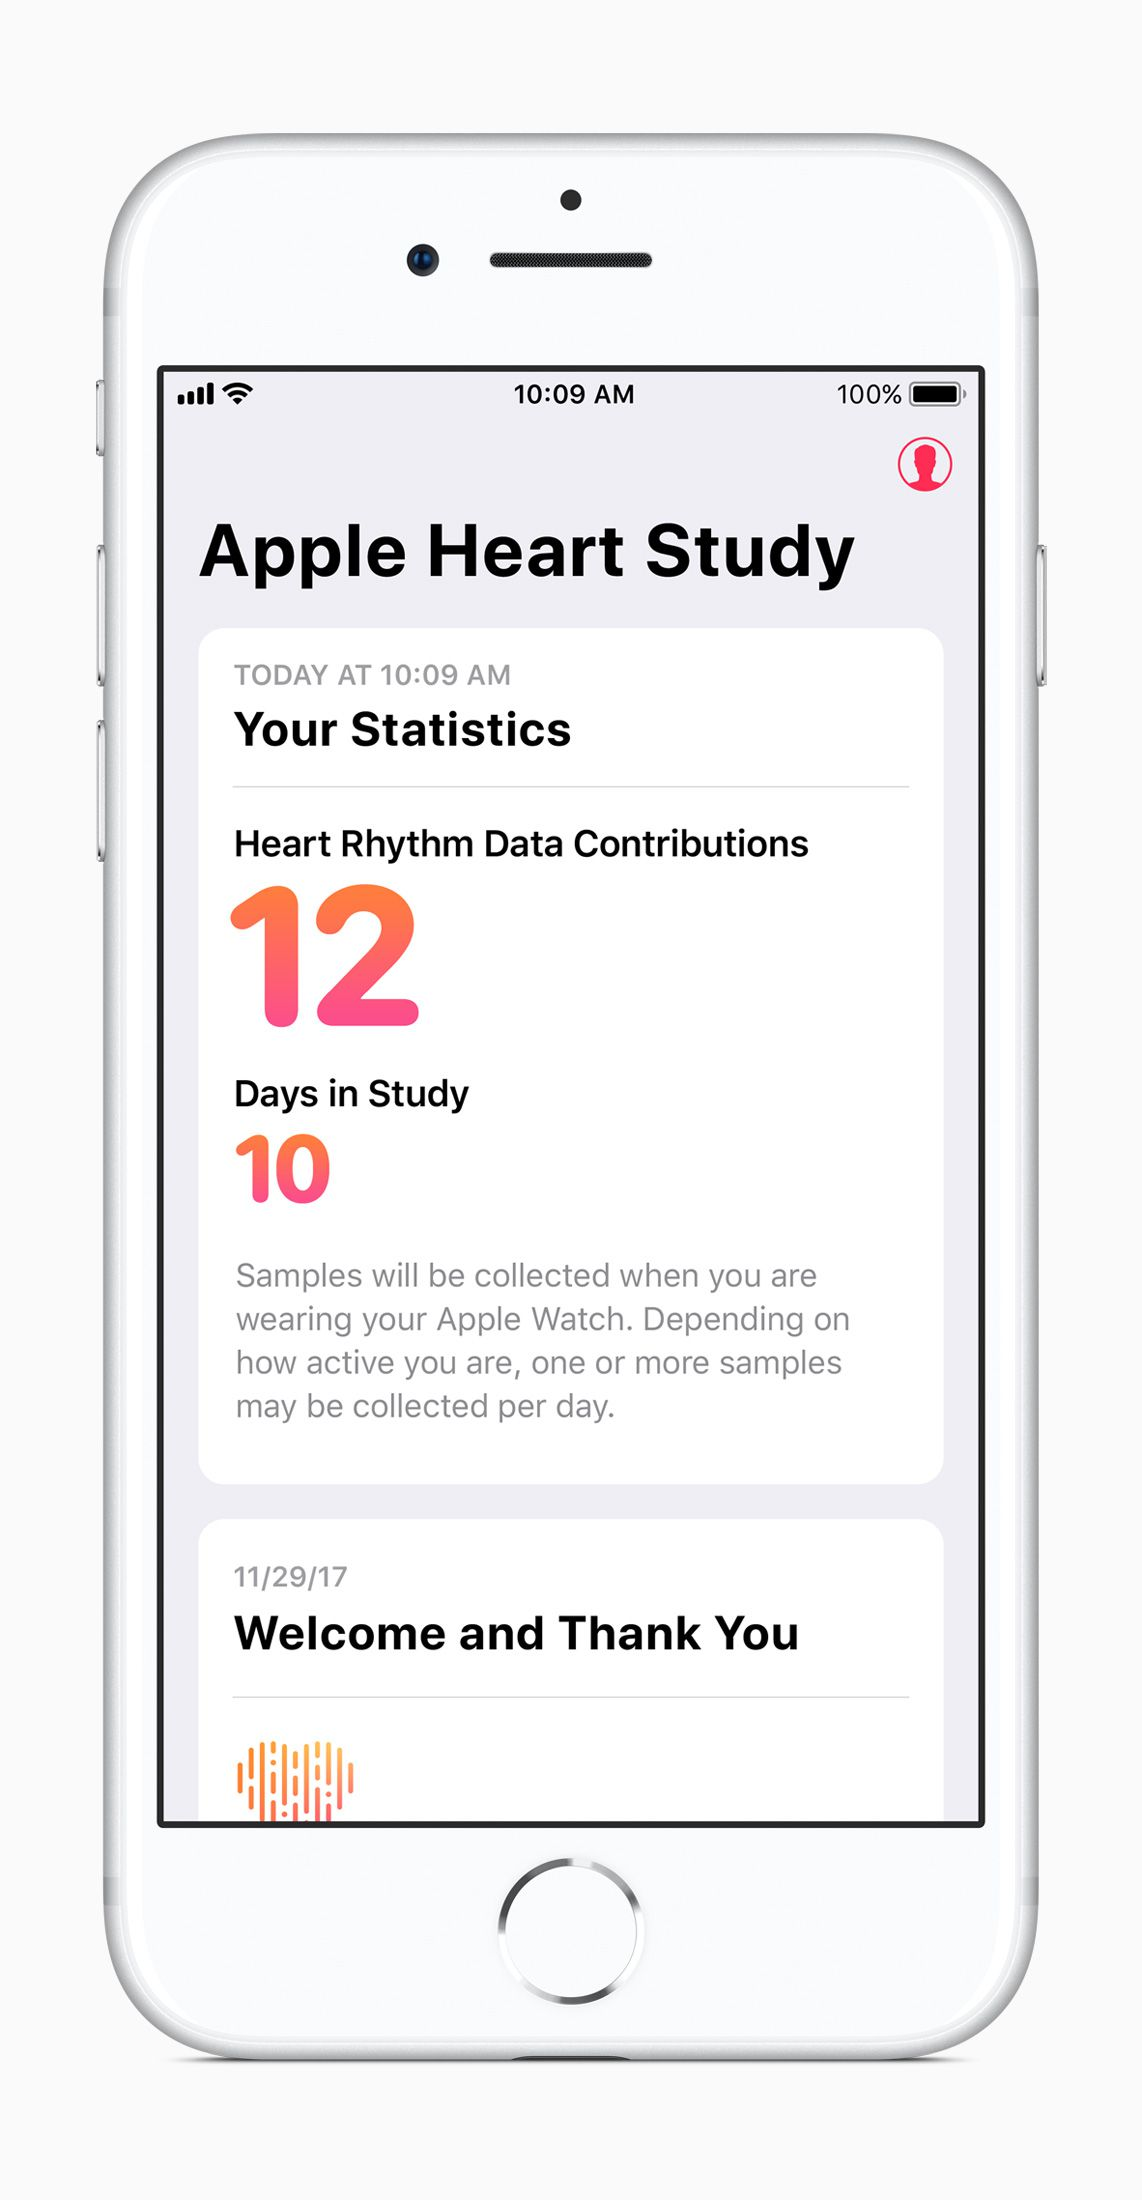 Apple launches study to identify irregular heart rhythms on